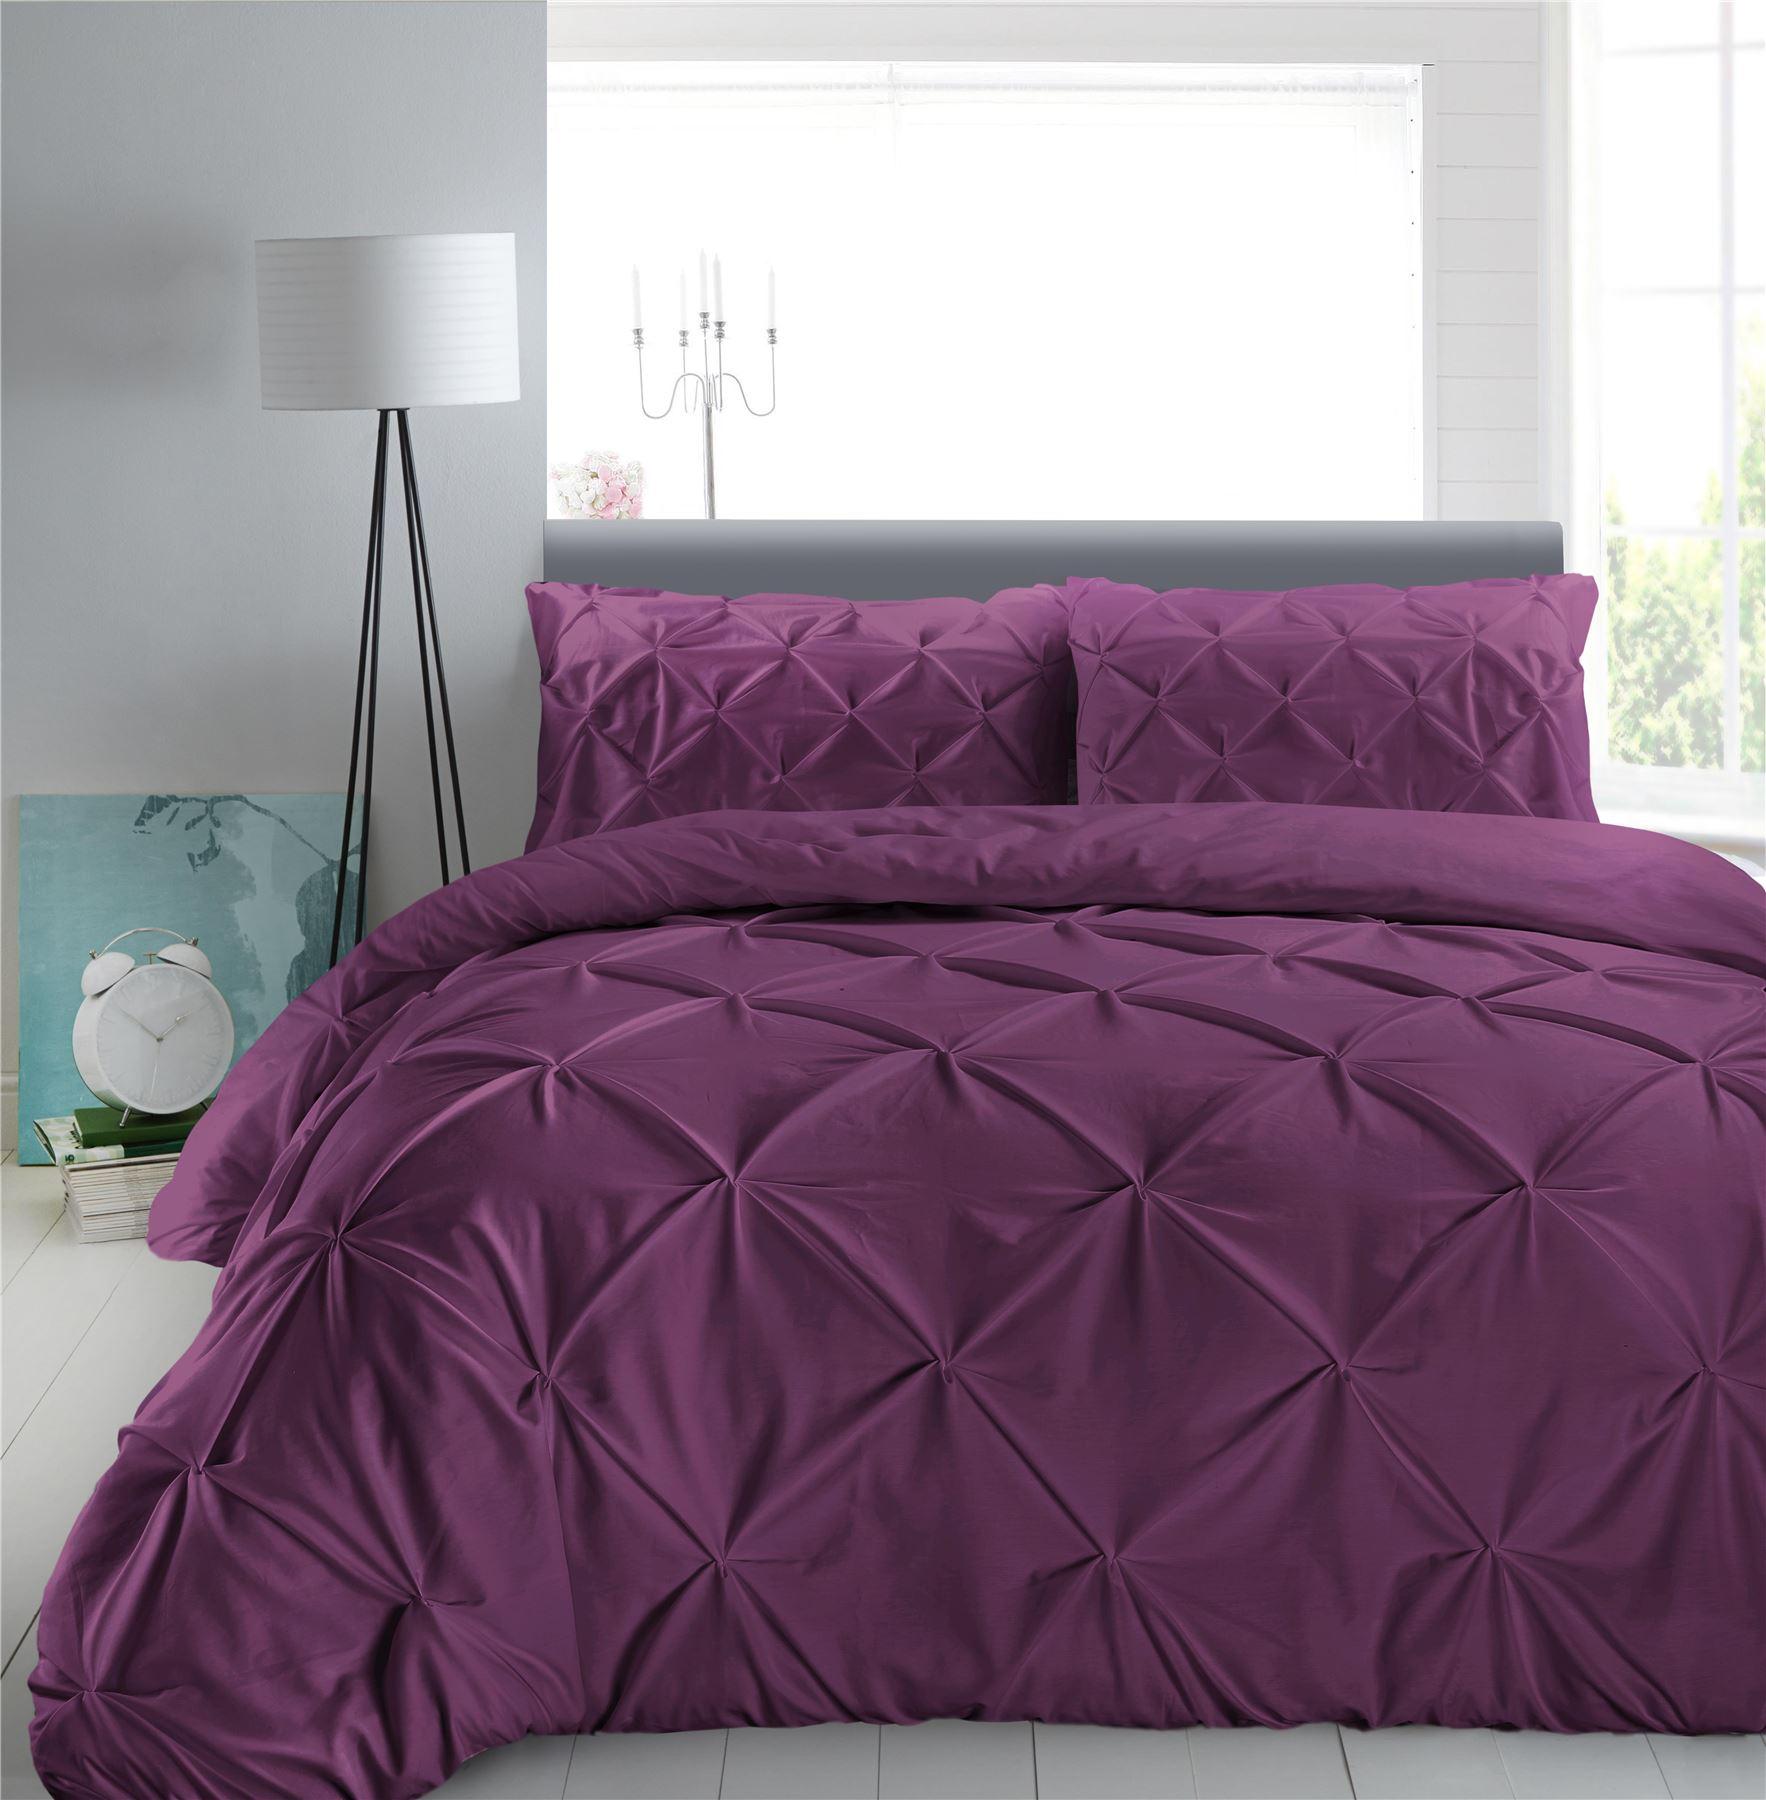 Luxury-Pure-100-Cotton-200-Thread-Pinch-Pleat-Pintuck-Puckering-Duvet-Cover-Set thumbnail 32